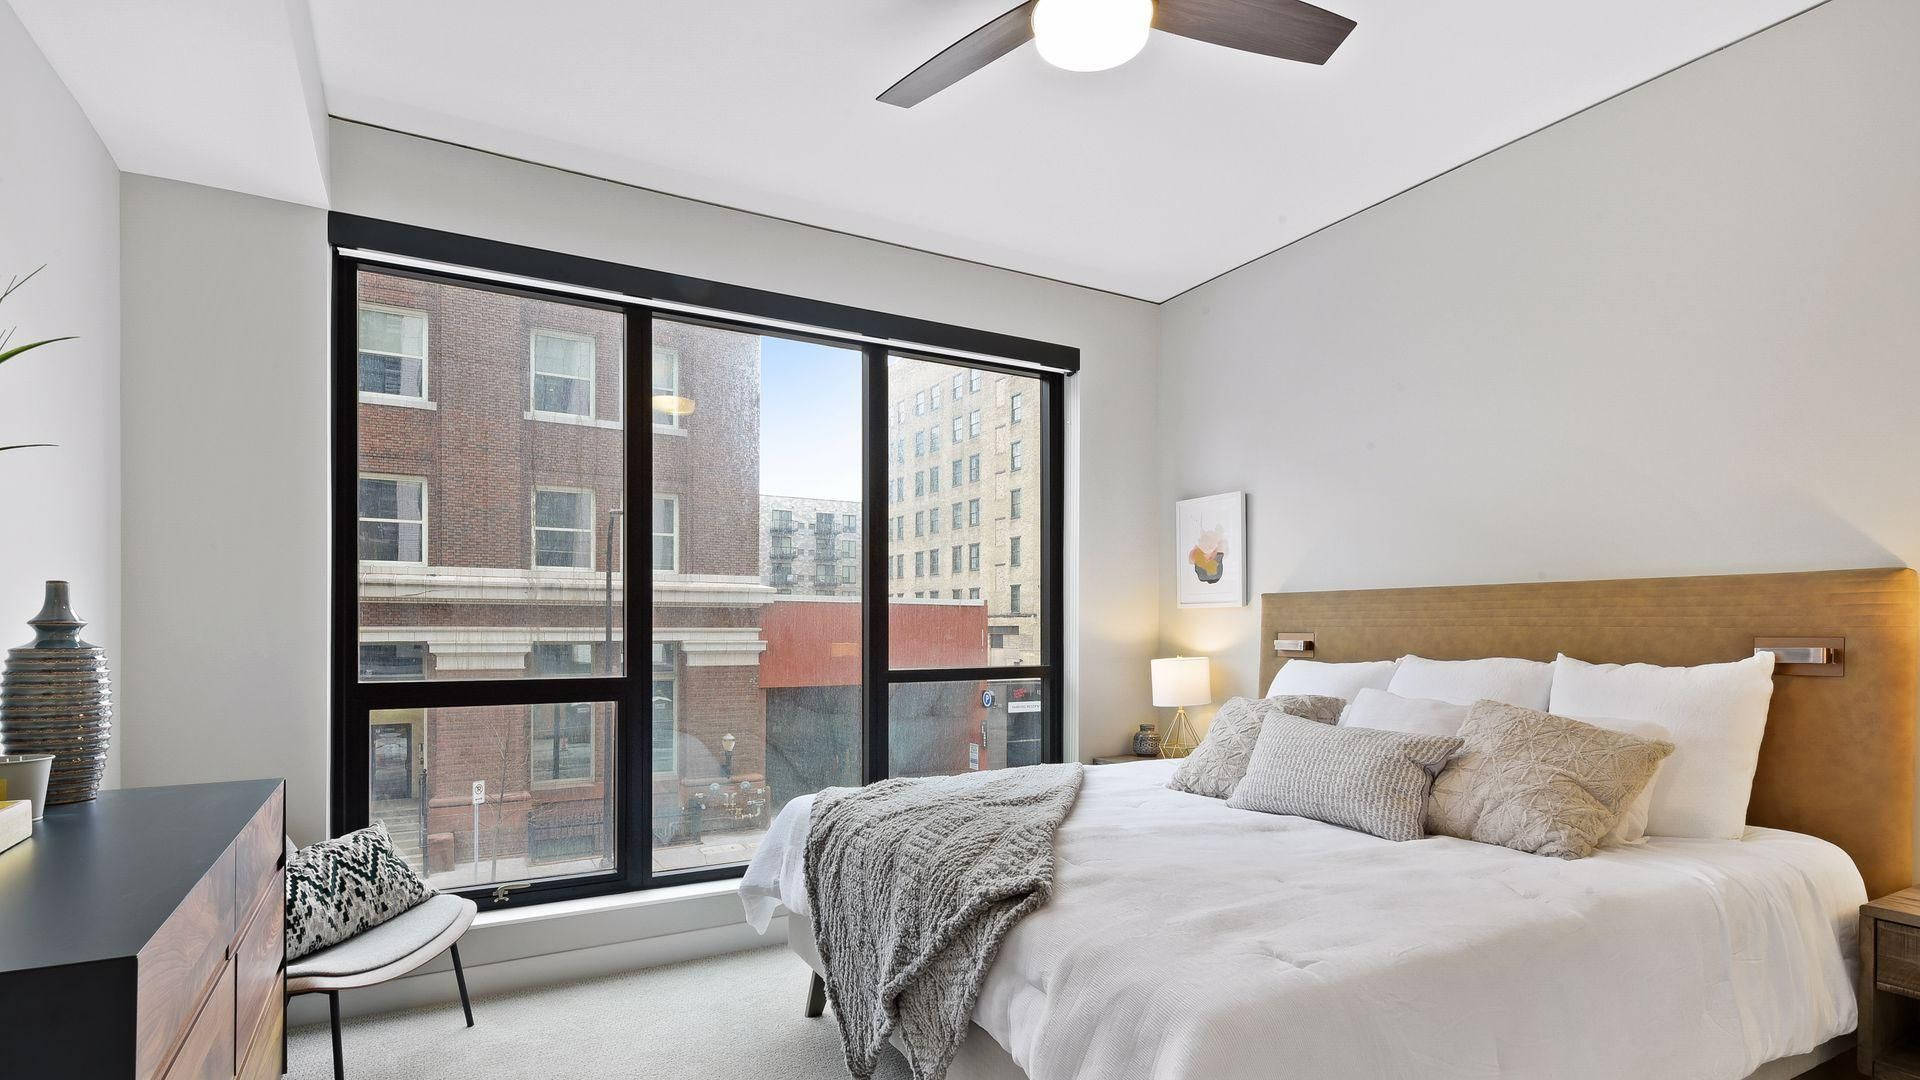 1 bedroom apartment at 240 park avenue minneapolis mn